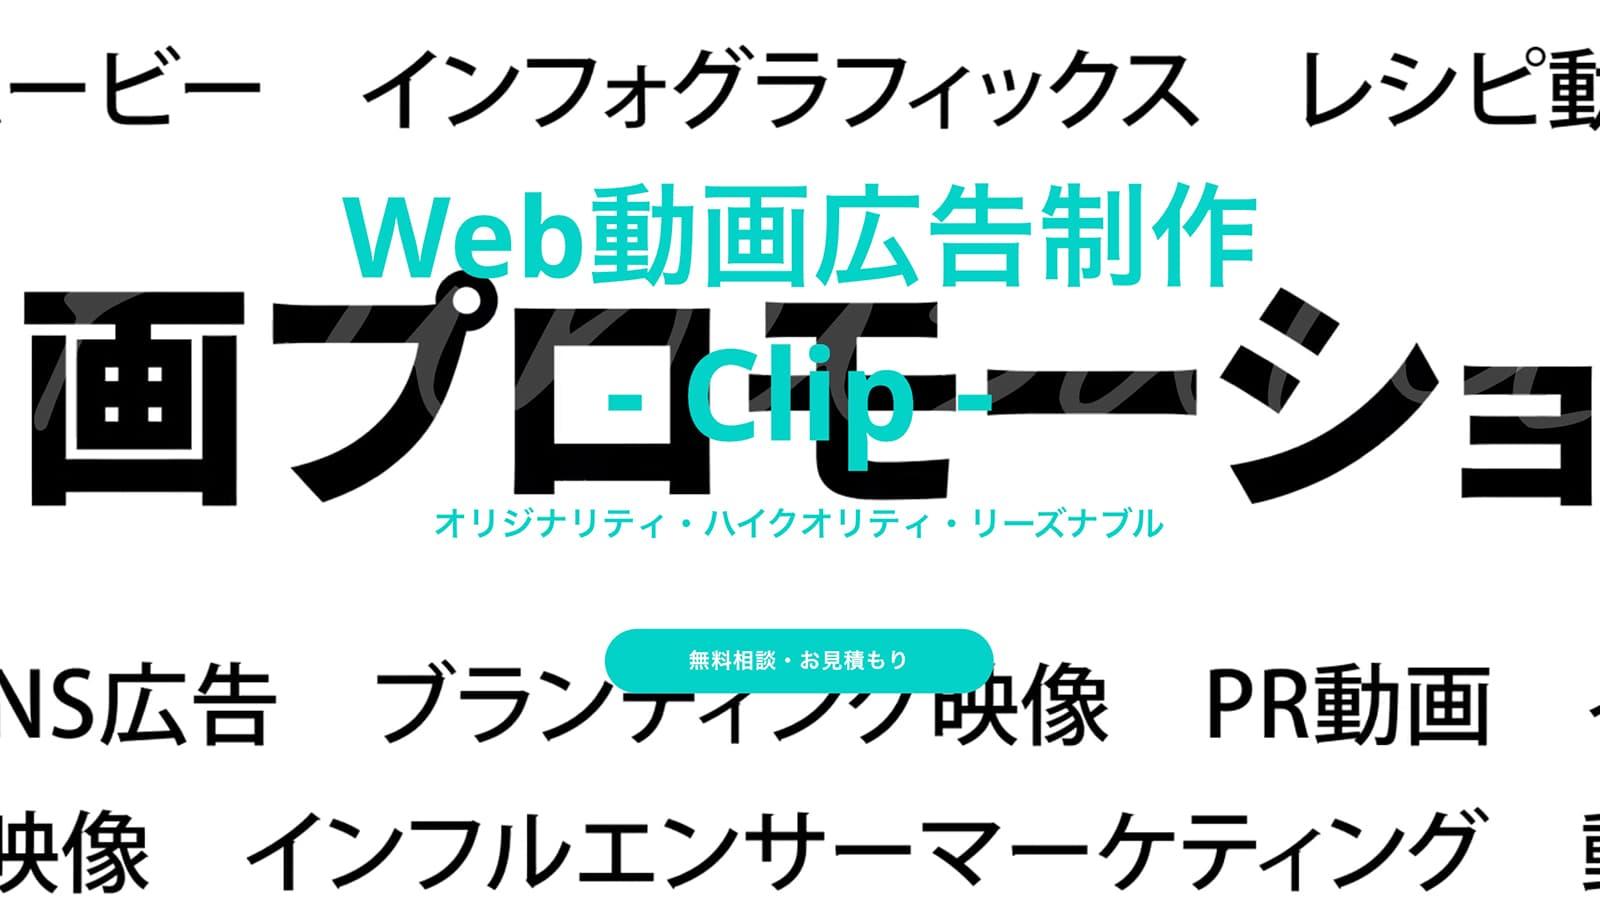 Web動画広告制作「Clip クリップ」